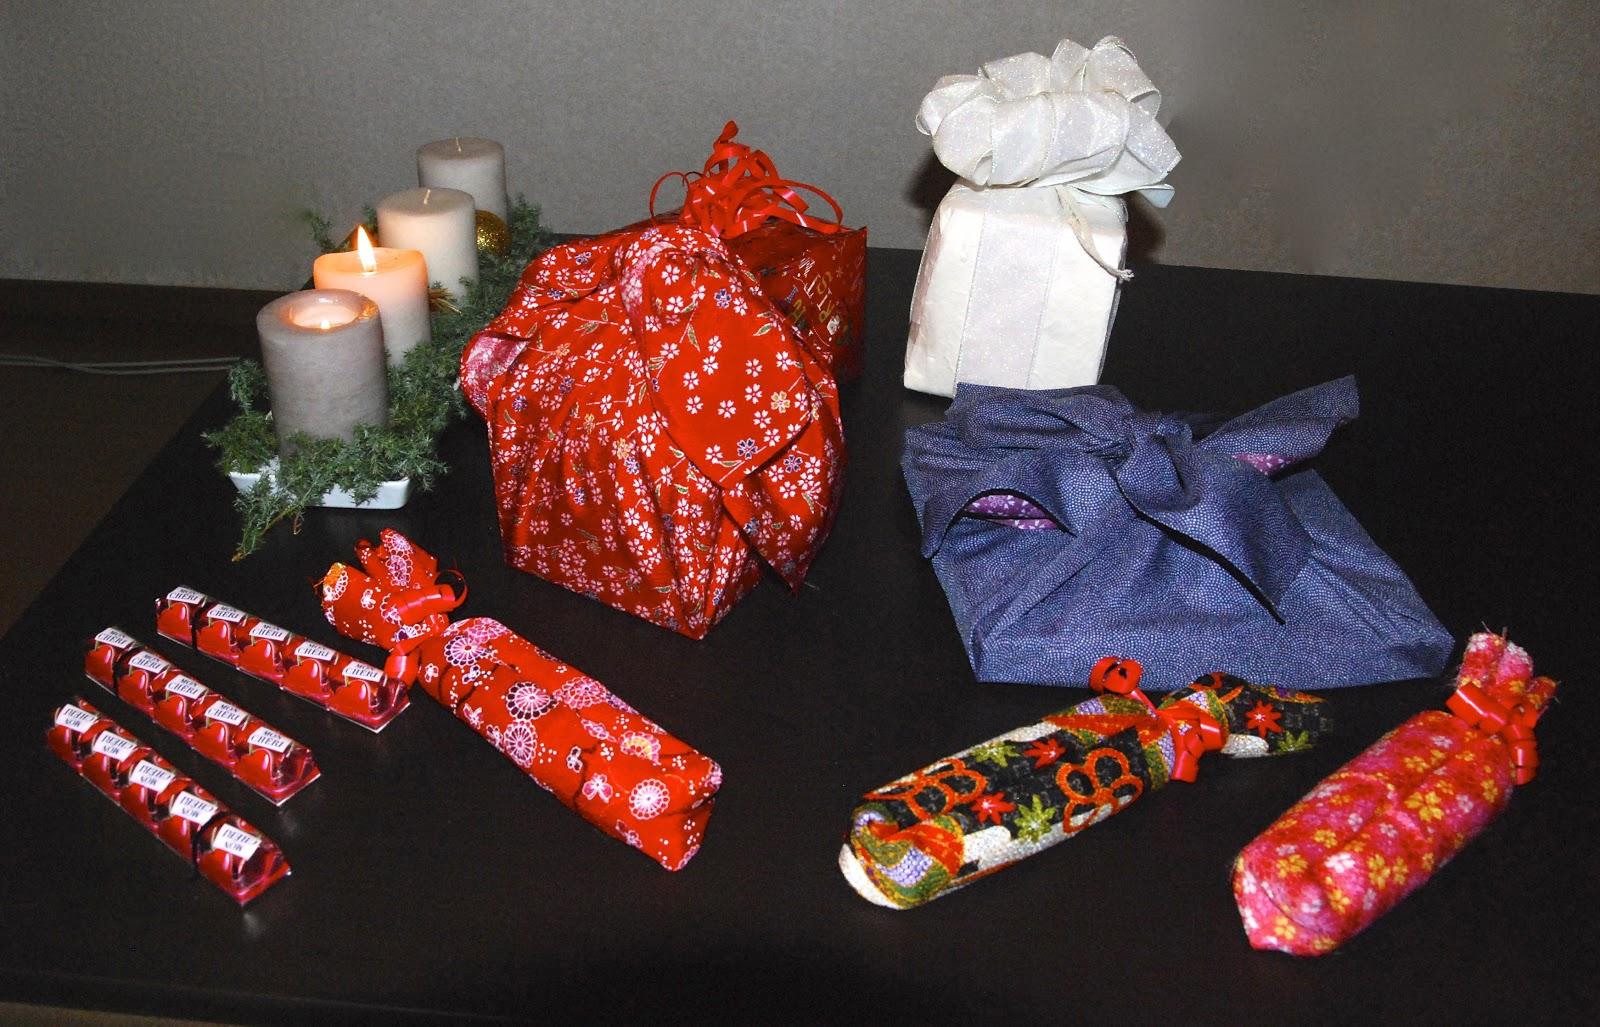 furoshiki japanisch geschenke verpacken. Black Bedroom Furniture Sets. Home Design Ideas